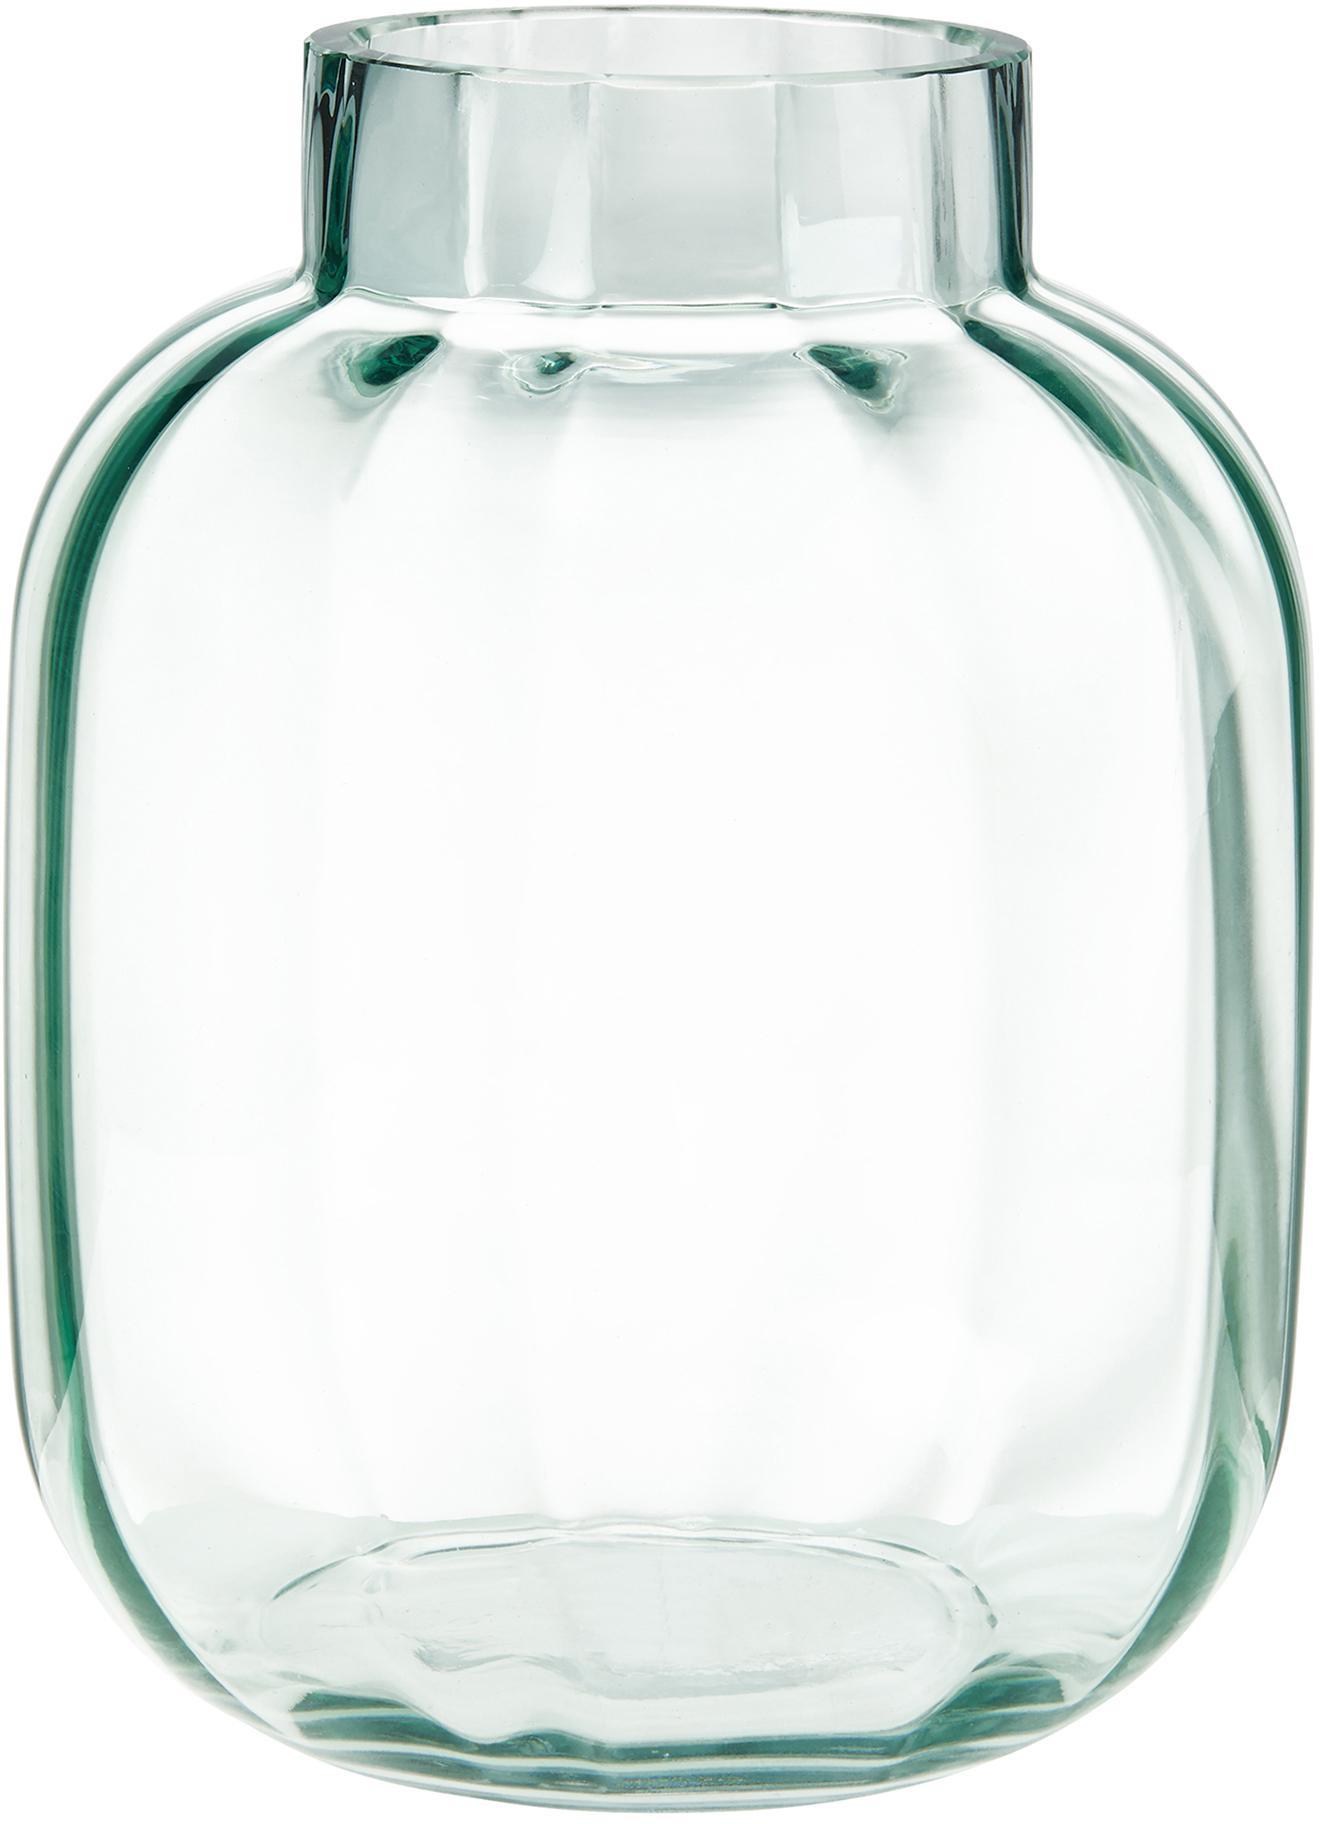 Jarrón de vidrio Betty, Vidrio, Verde claro transparente, Ø 18 x Al 22 cm